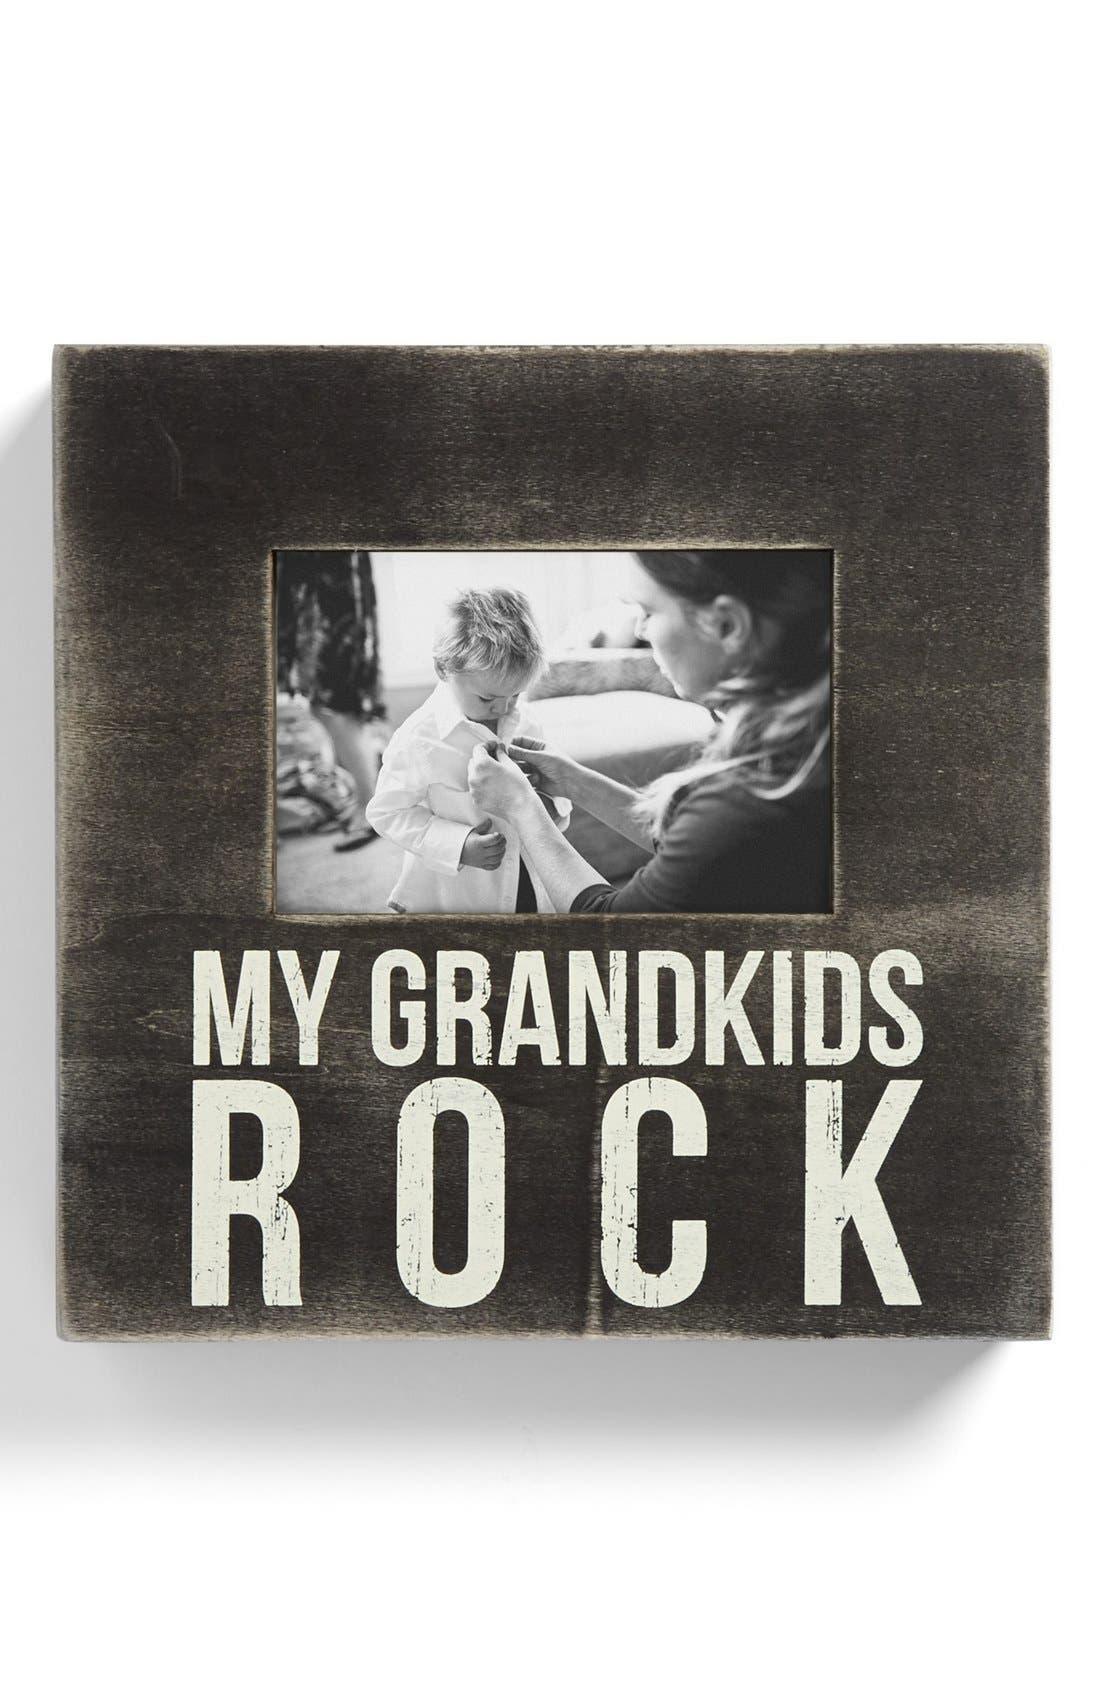 Alternate Image 1 Selected - Primitives by Kathy 'My Grandkids Rock' Box Frame